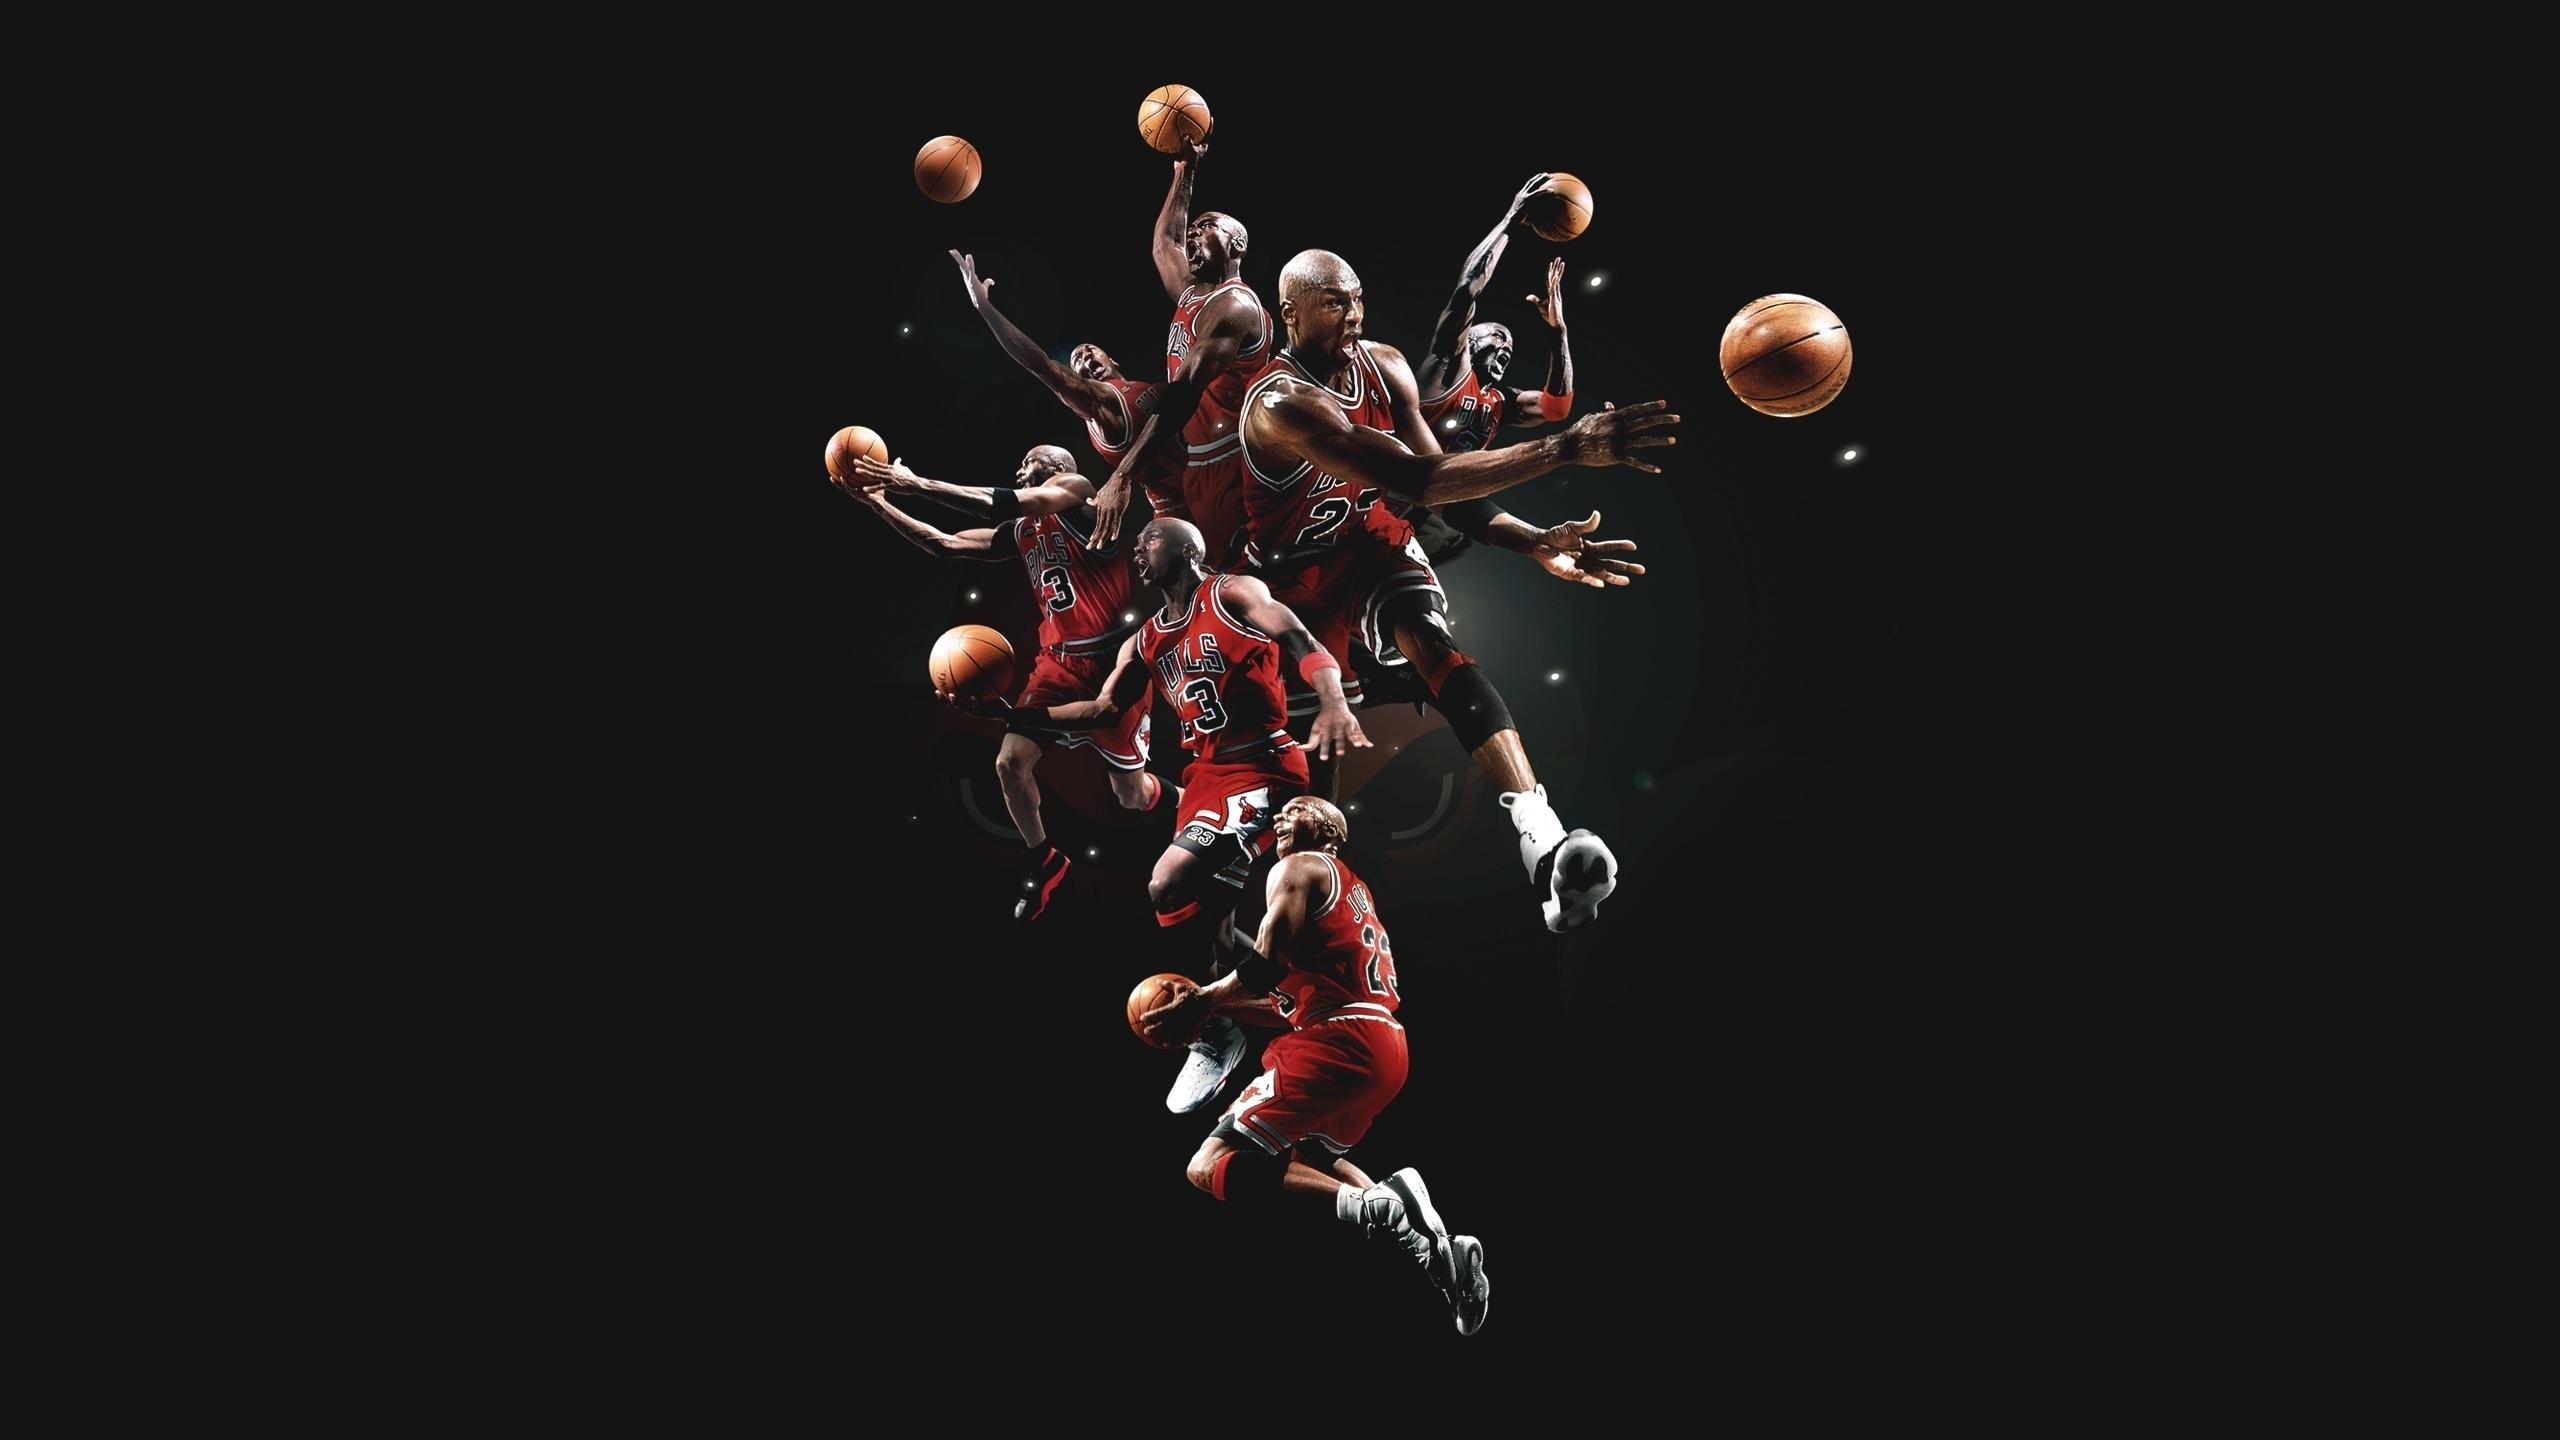 Michael jordan basketball chicago bulls men males action stop motion wallpaper | 2560x1440 | 43901 | WallpaperUP